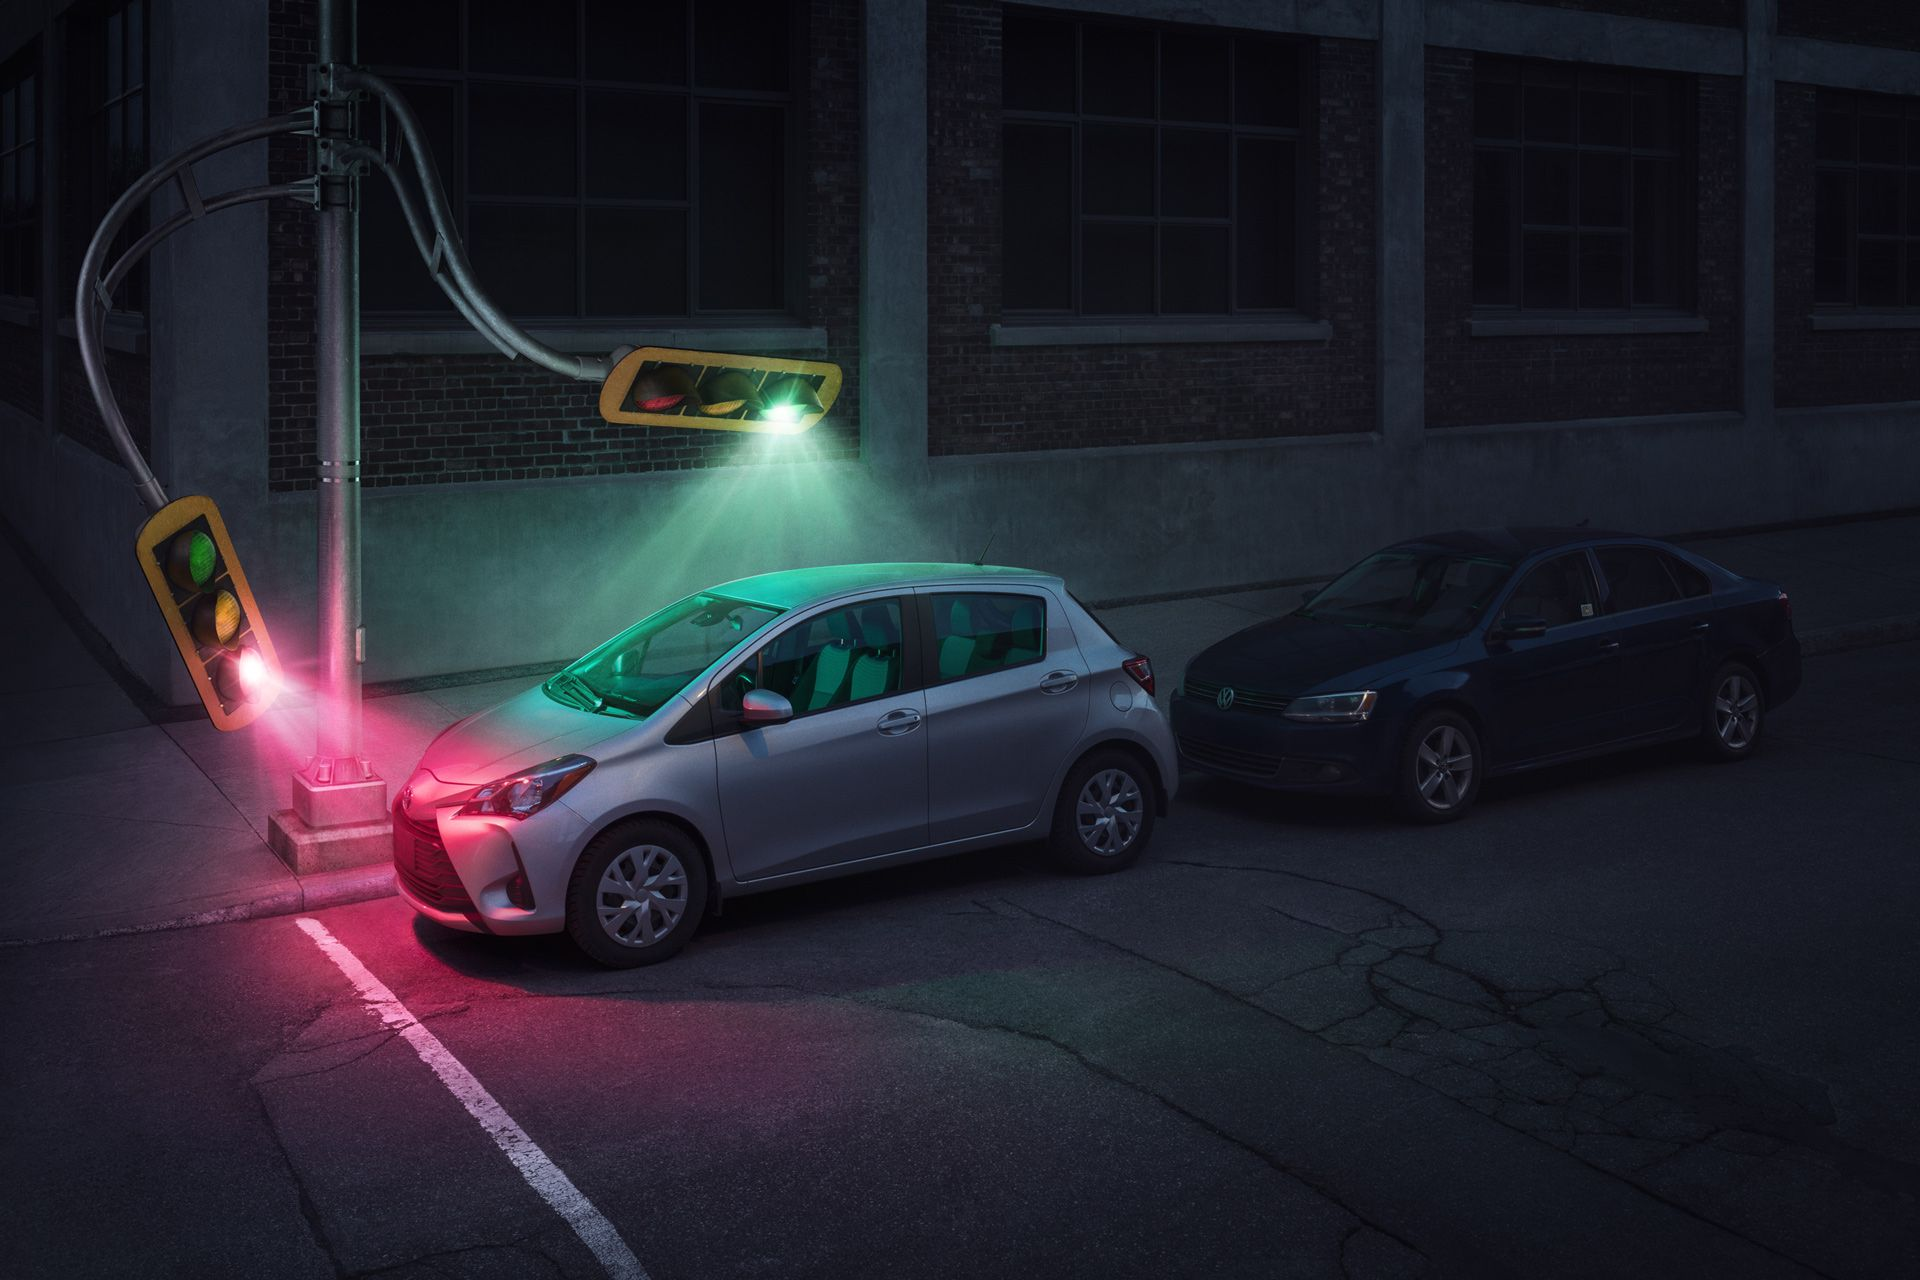 street lights bending to illuminate a grey car by Simon Duhamel for Sherlock and BleuBlancRouge